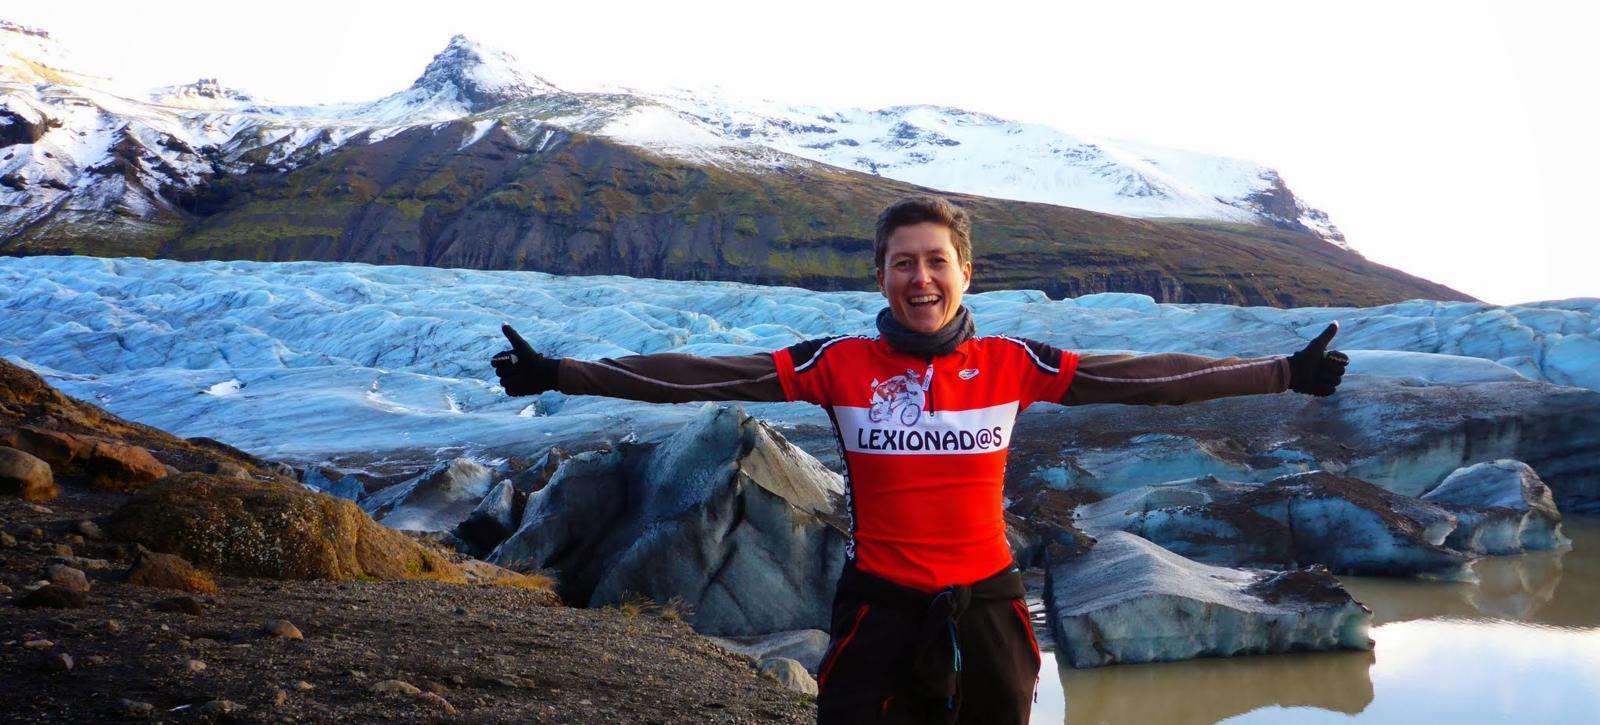 Olga Villanueva Vázquez – Fotos del viaje Escapada a Islandia